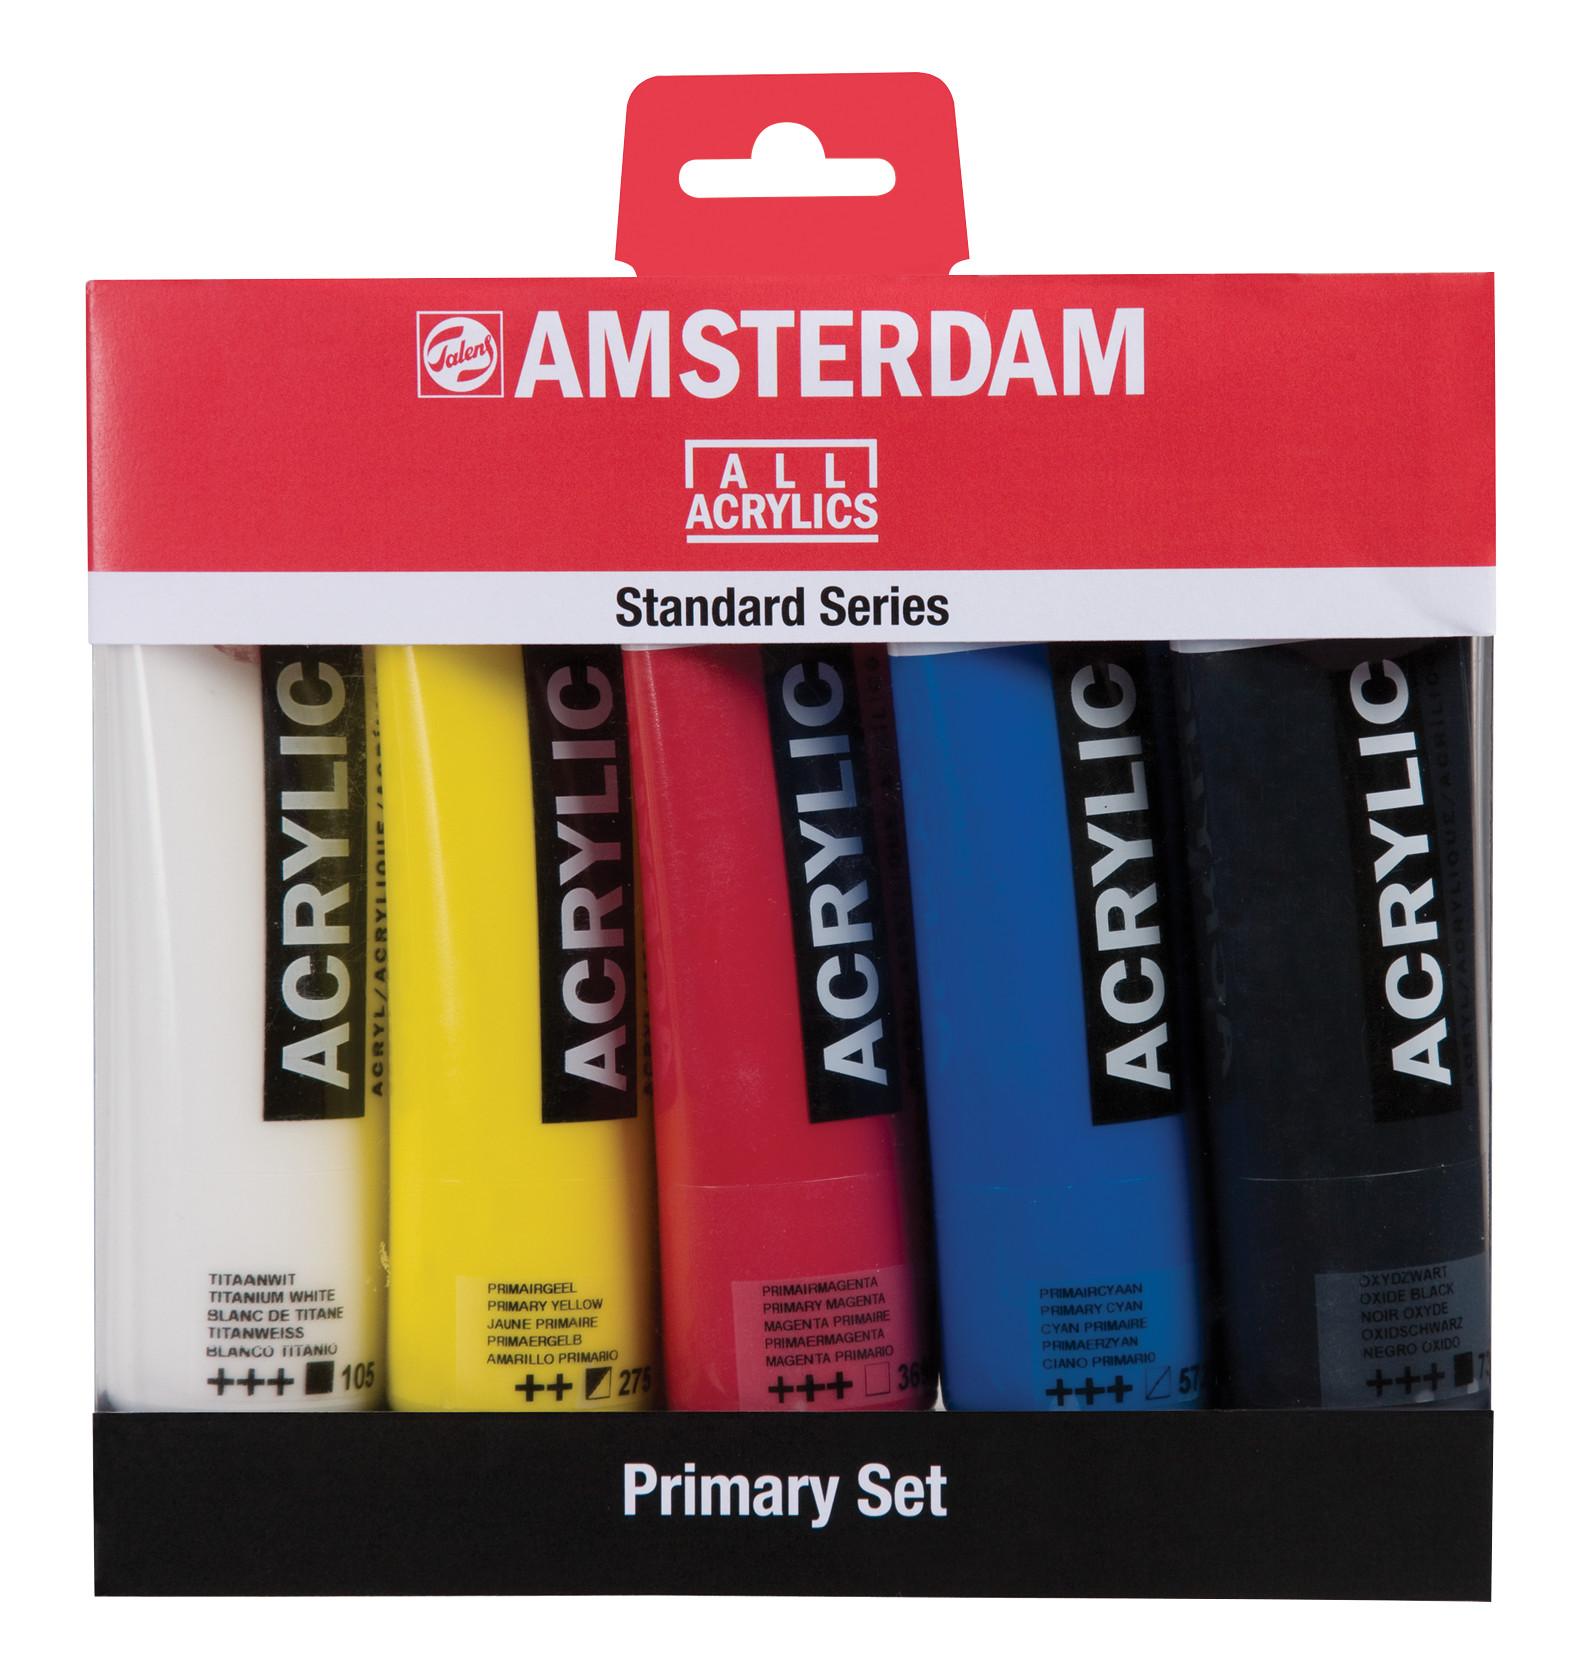 Amsterdam Standard Series Acrylics Primary Set - 5 x 120 ml